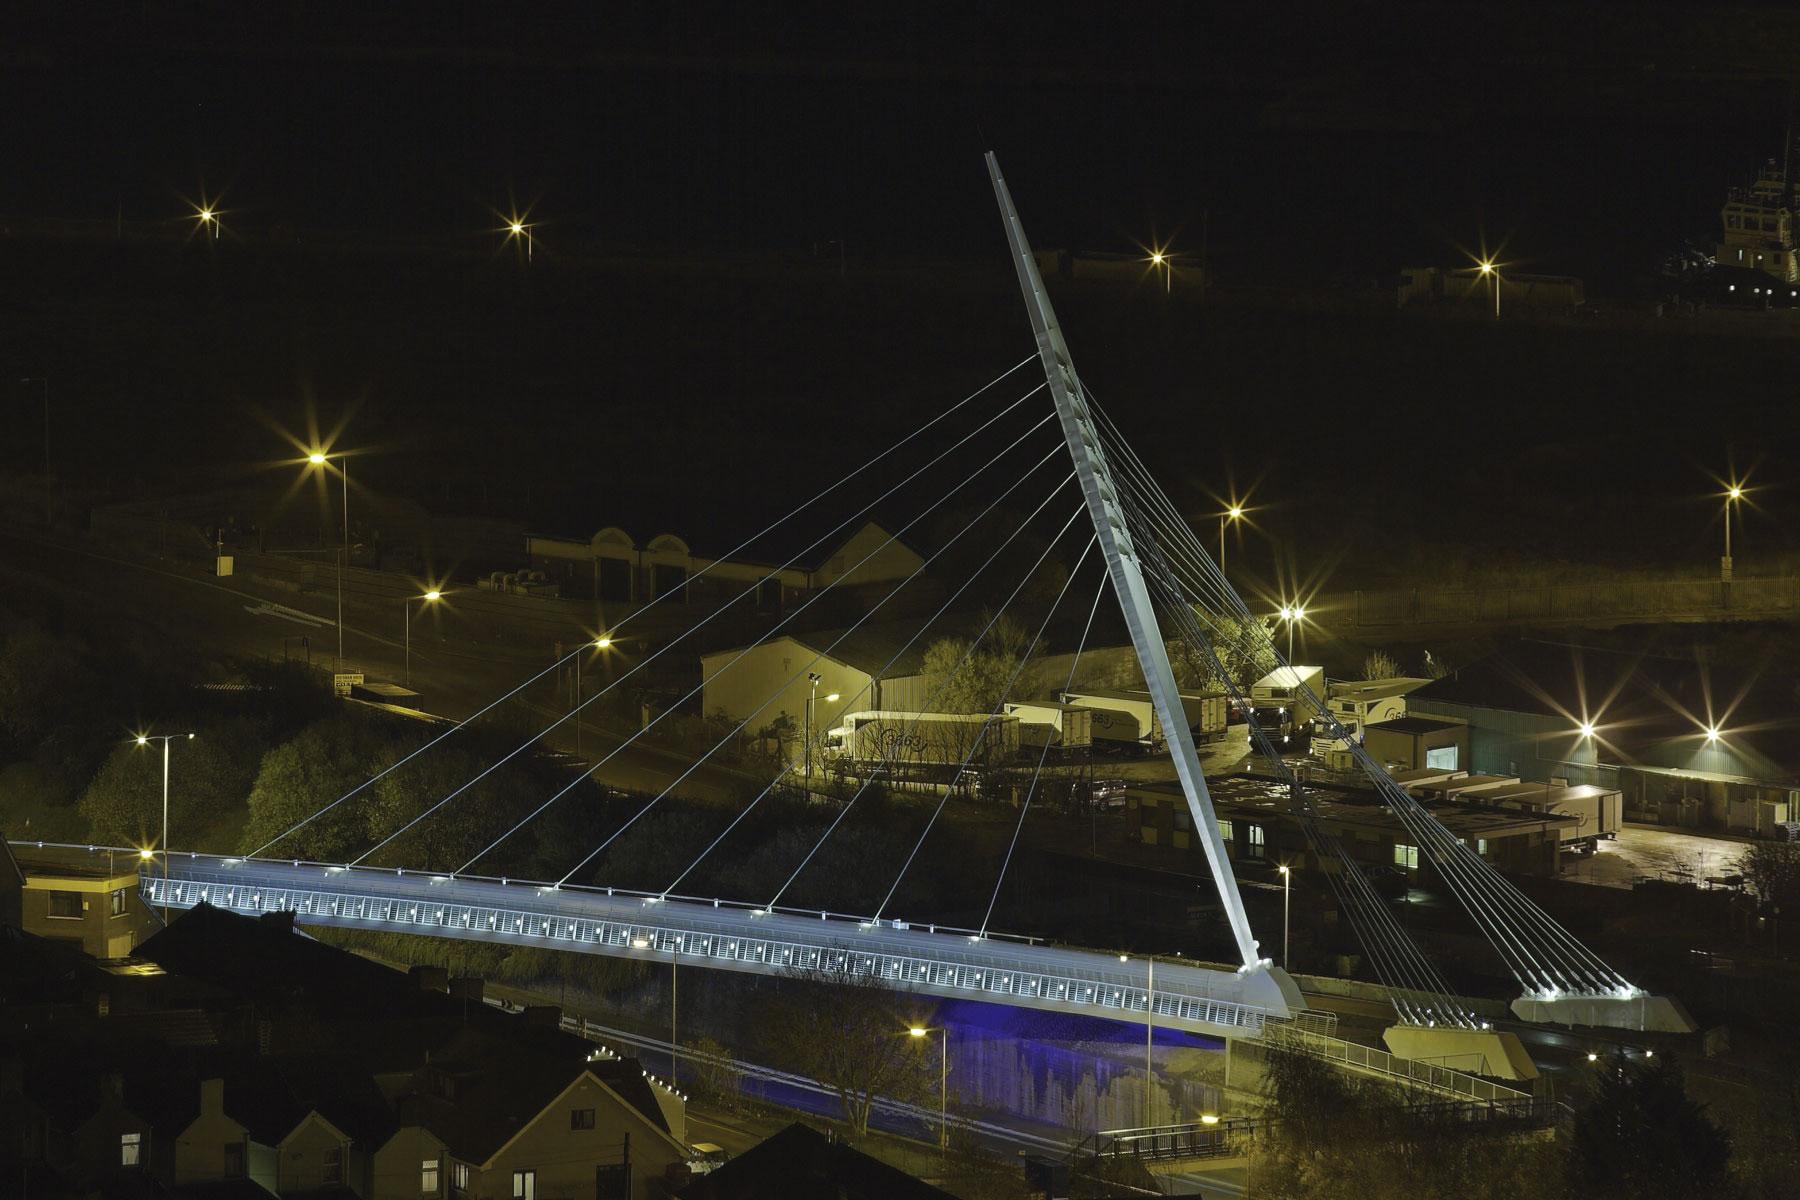 SSDA 2008 – The Sidings Bridge, Swansea